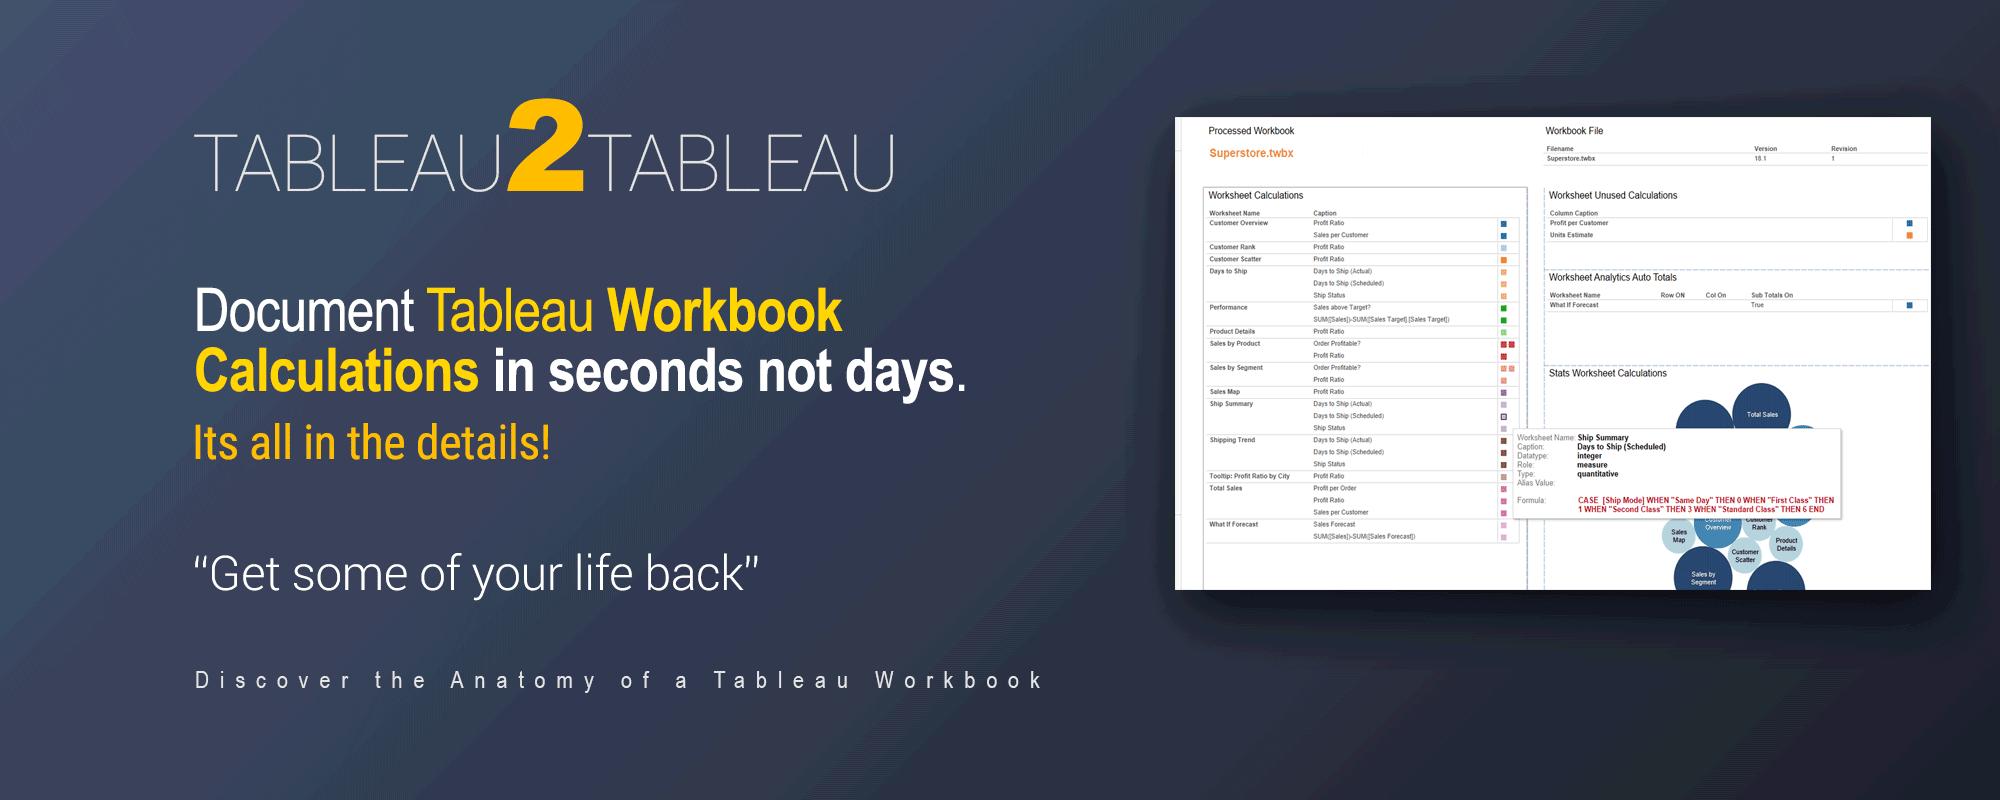 Document Tableau workbook Calculations |Tableau2Tableau | 4ED